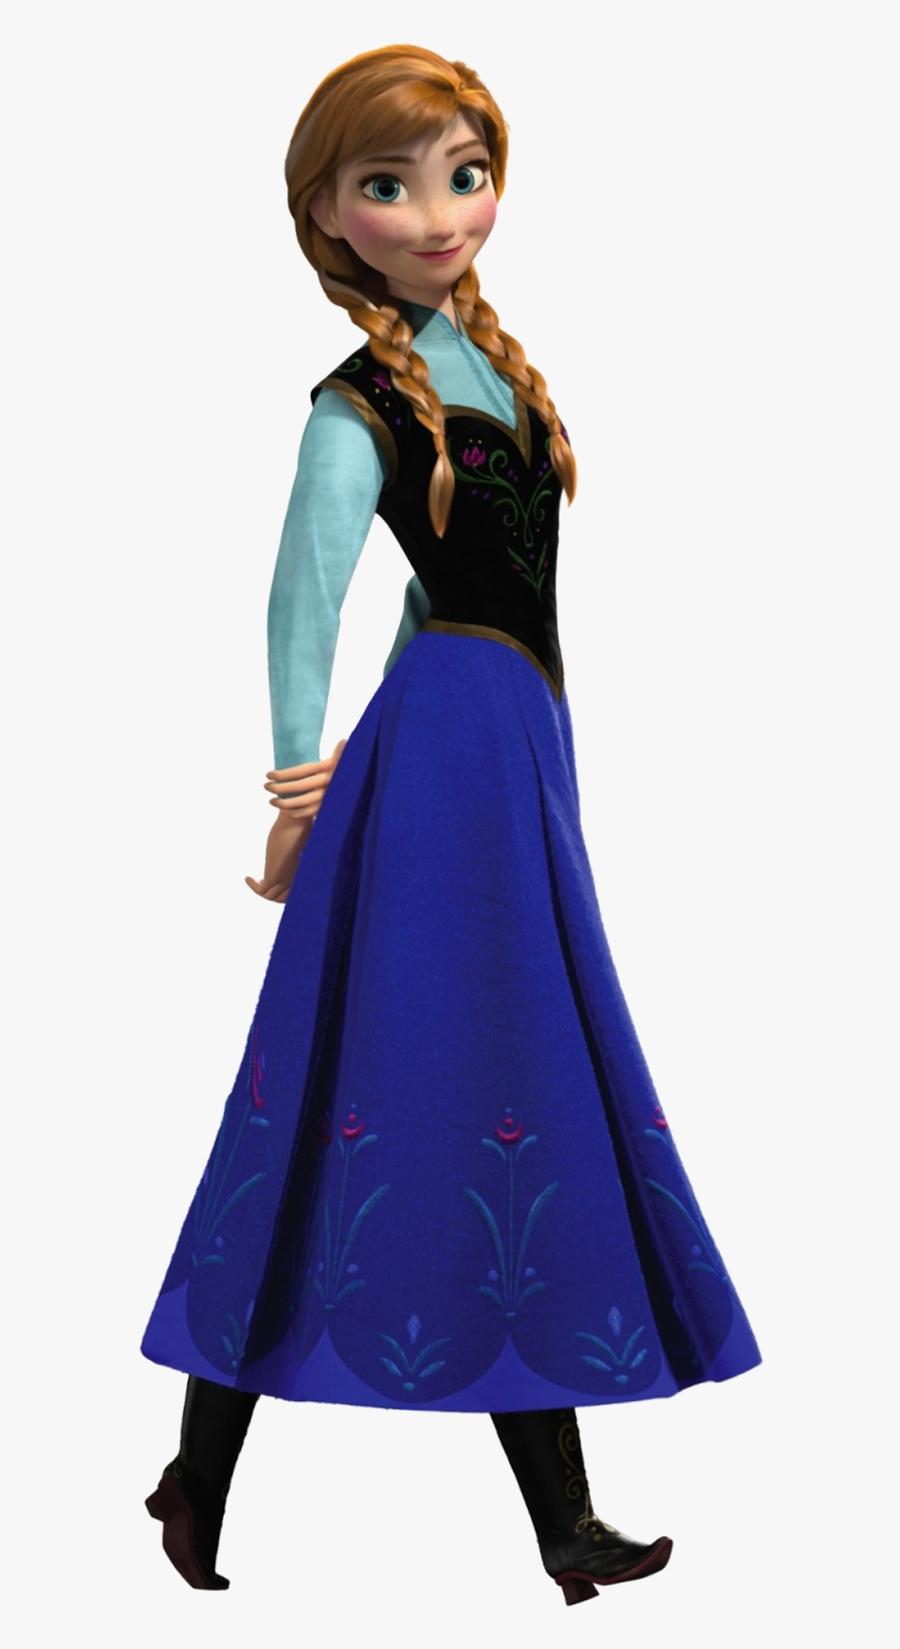 Transparent Costumes Clipart - Elsa Anna Frozen Characters, Transparent Clipart